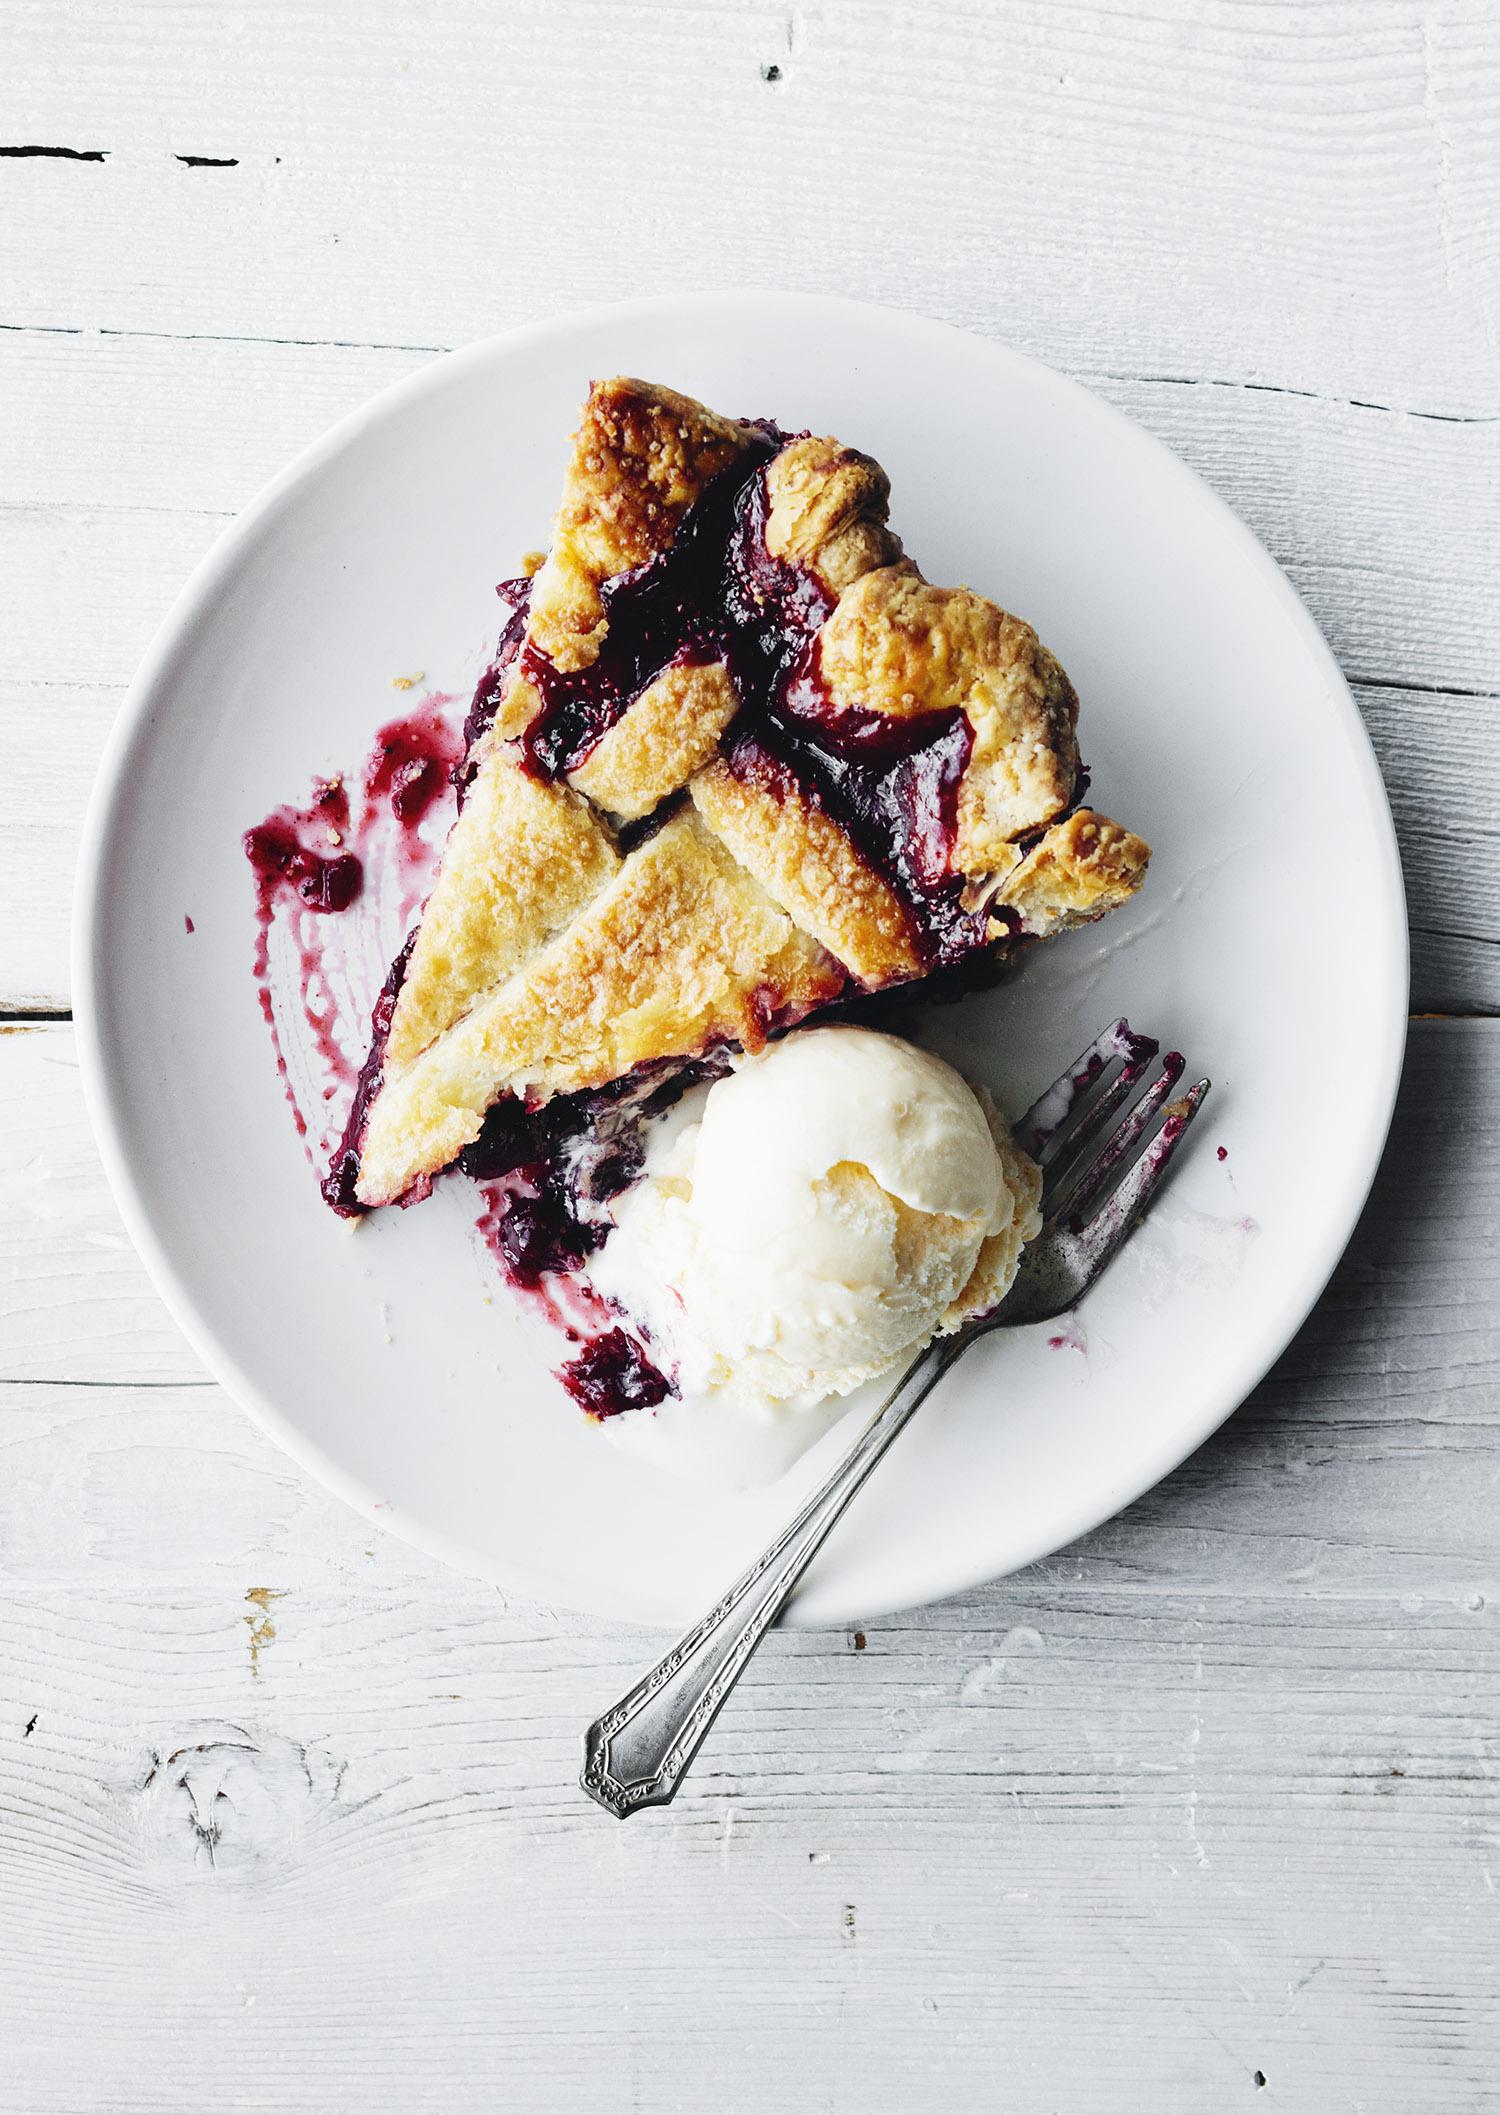 Pie_Cherry7387_final.jpg